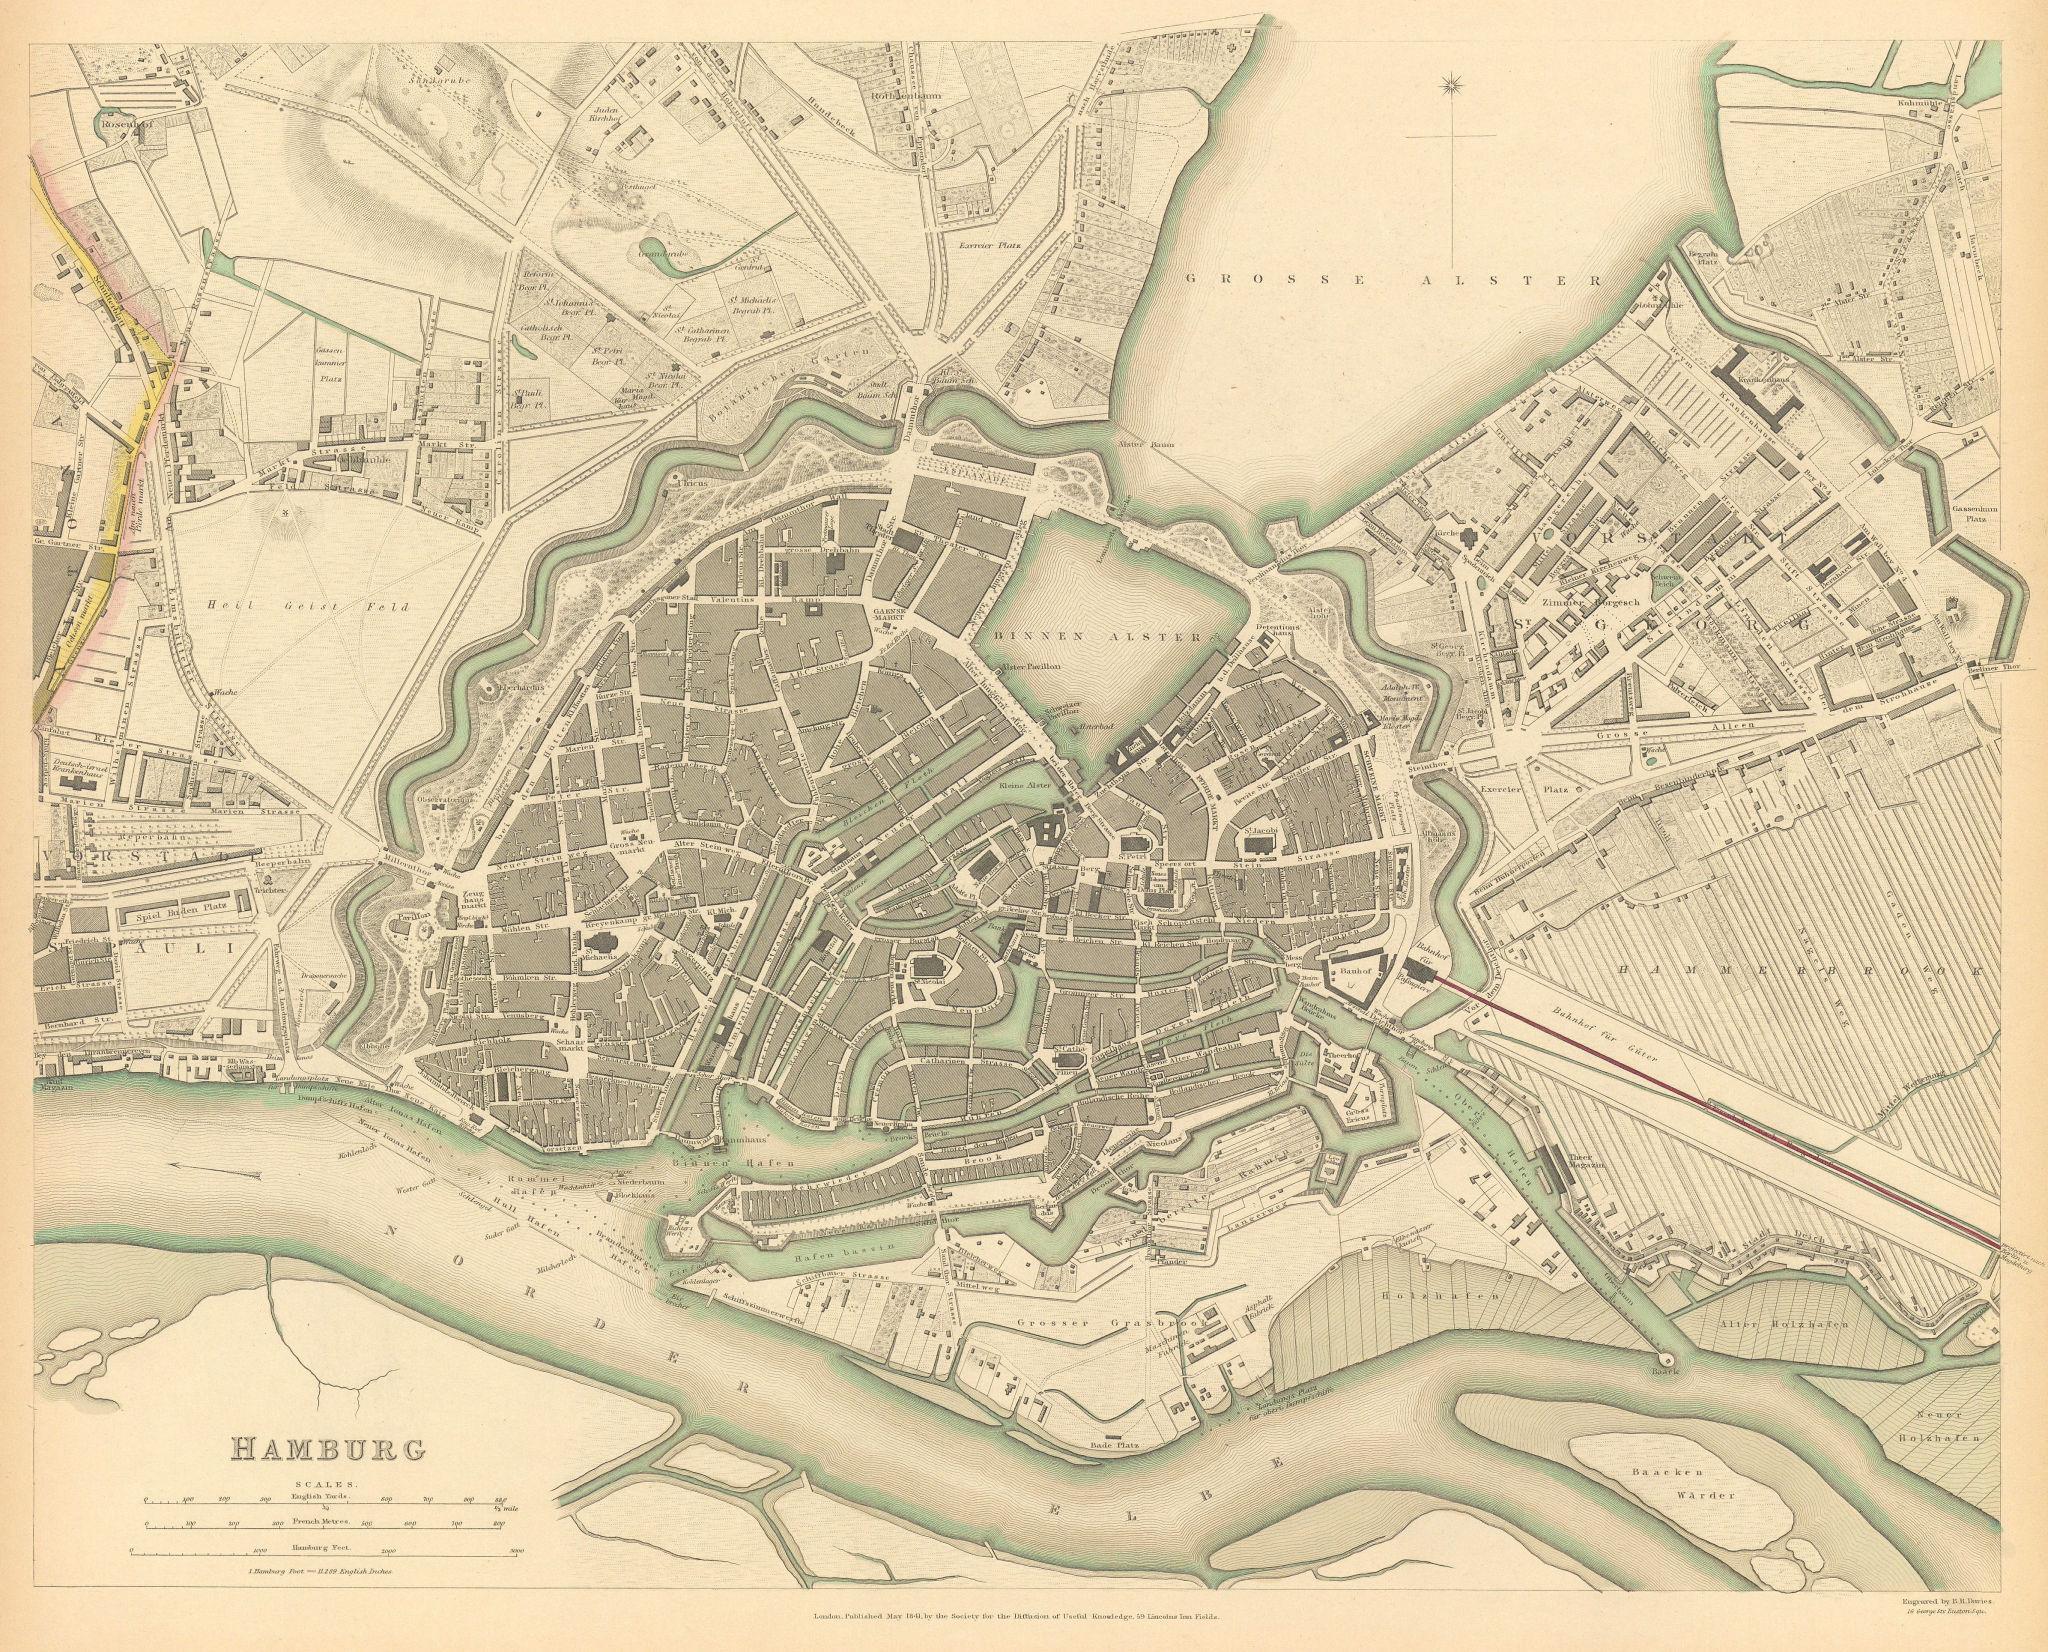 HAMBURG. Antique town city map plan. SDUK 1844 old chart